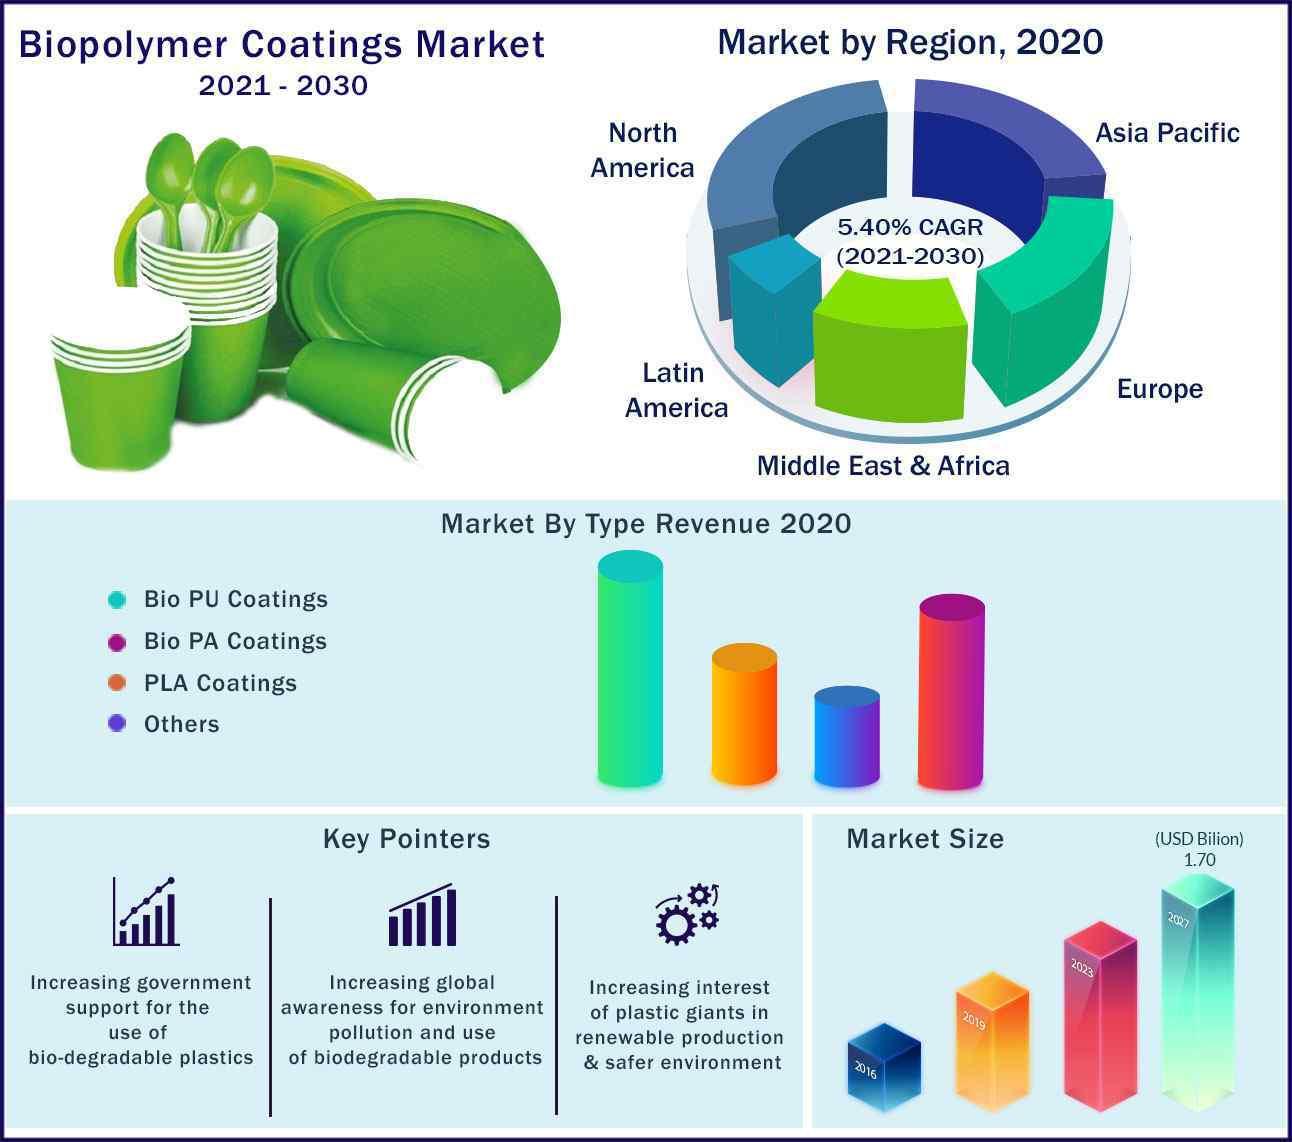 Global Biopolymer Coatings Market